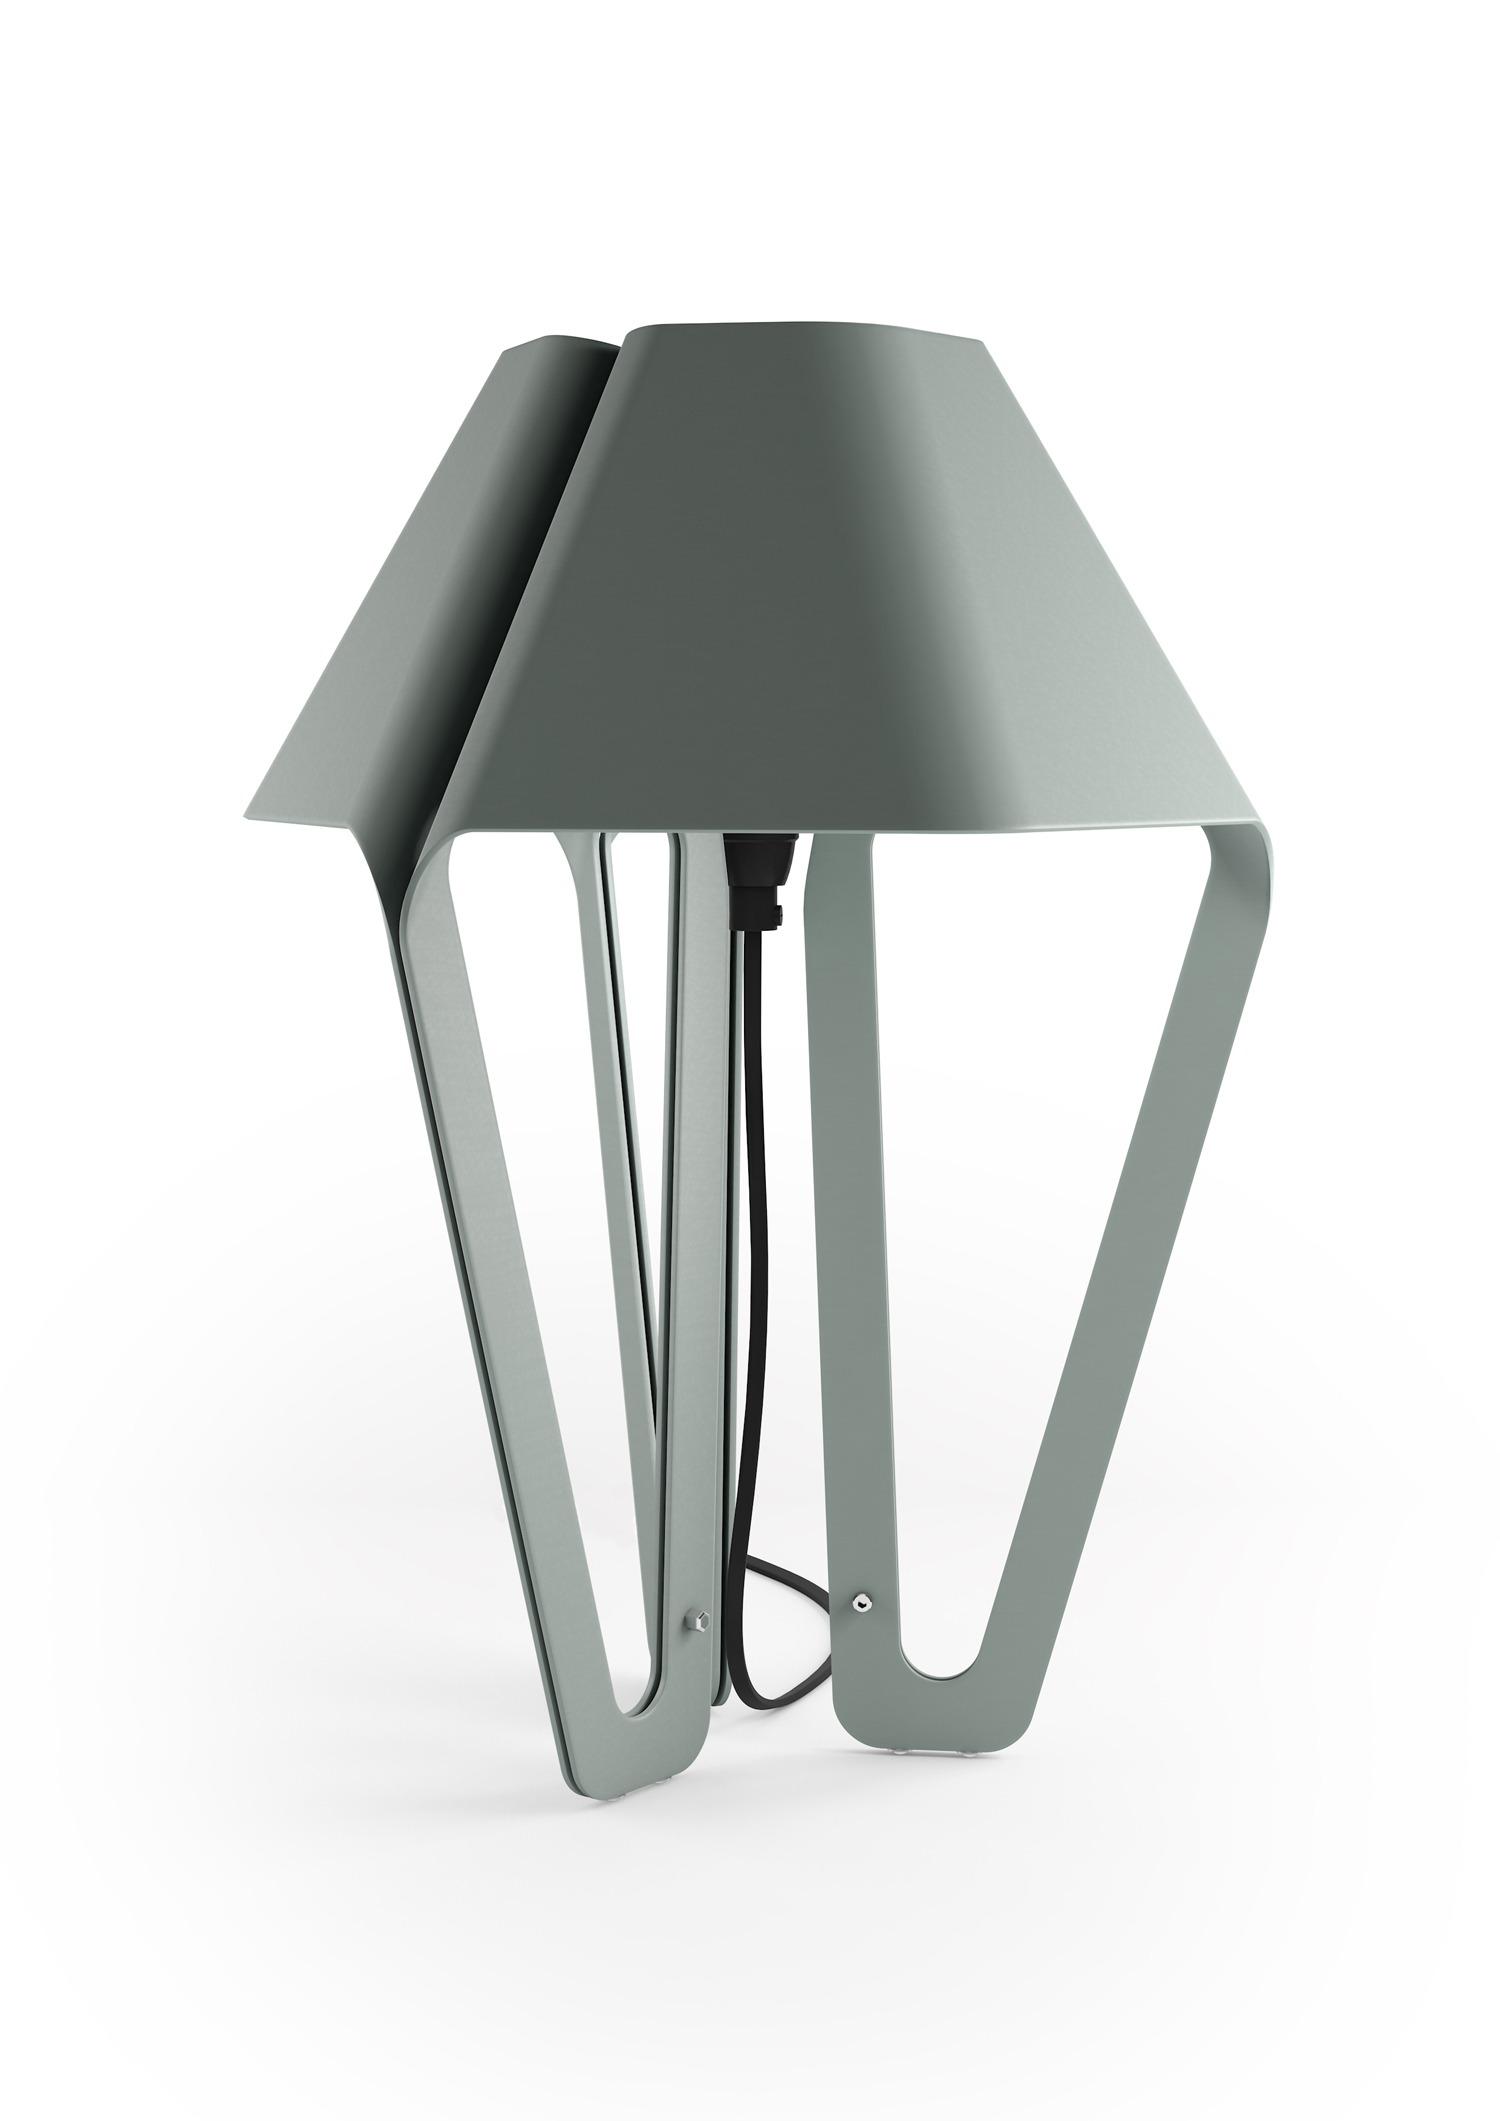 Bas Vellekoop – Hexa High – ocean gray – 02 – 1500px